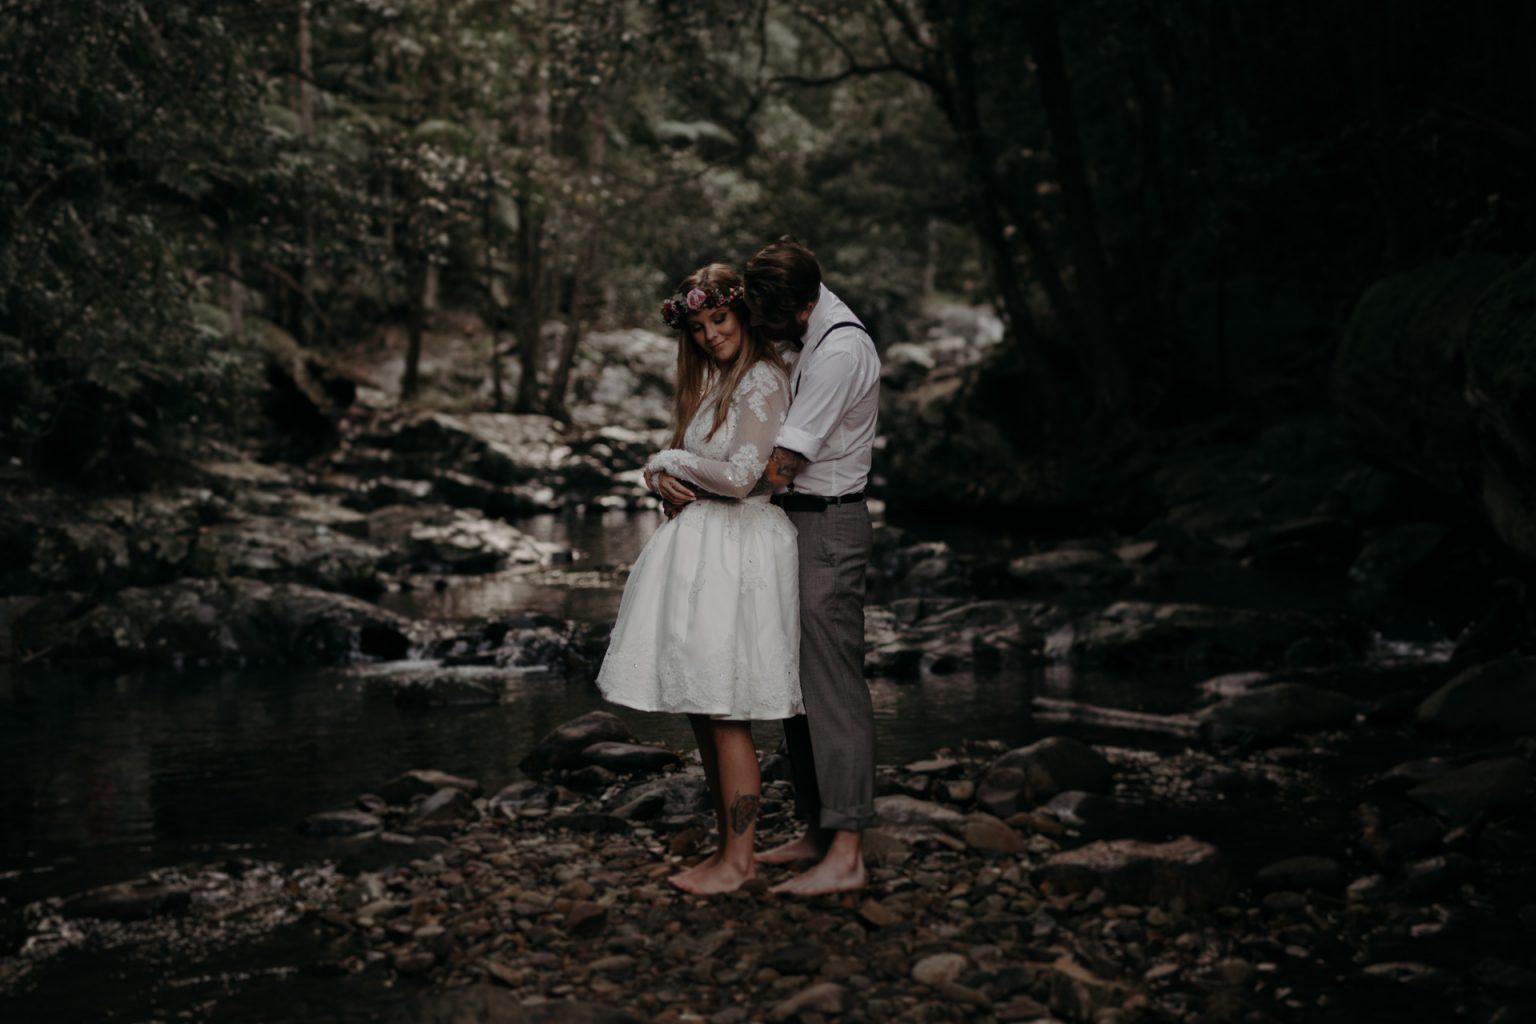 bride groom hug in forest cougal cascades currumbin